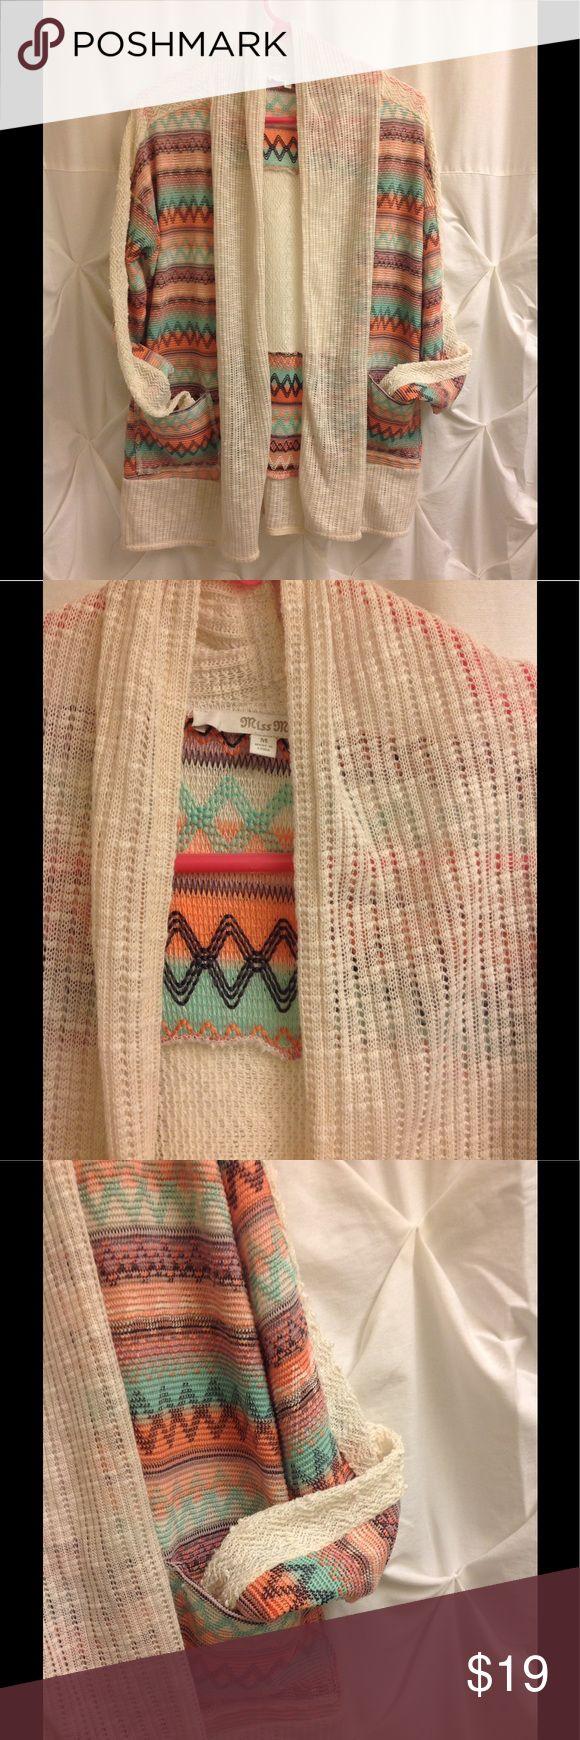 Miss me Aztec print cardigan M Miss me Aztec print cardigan Sweater M Miss Me Sweaters Cardigans